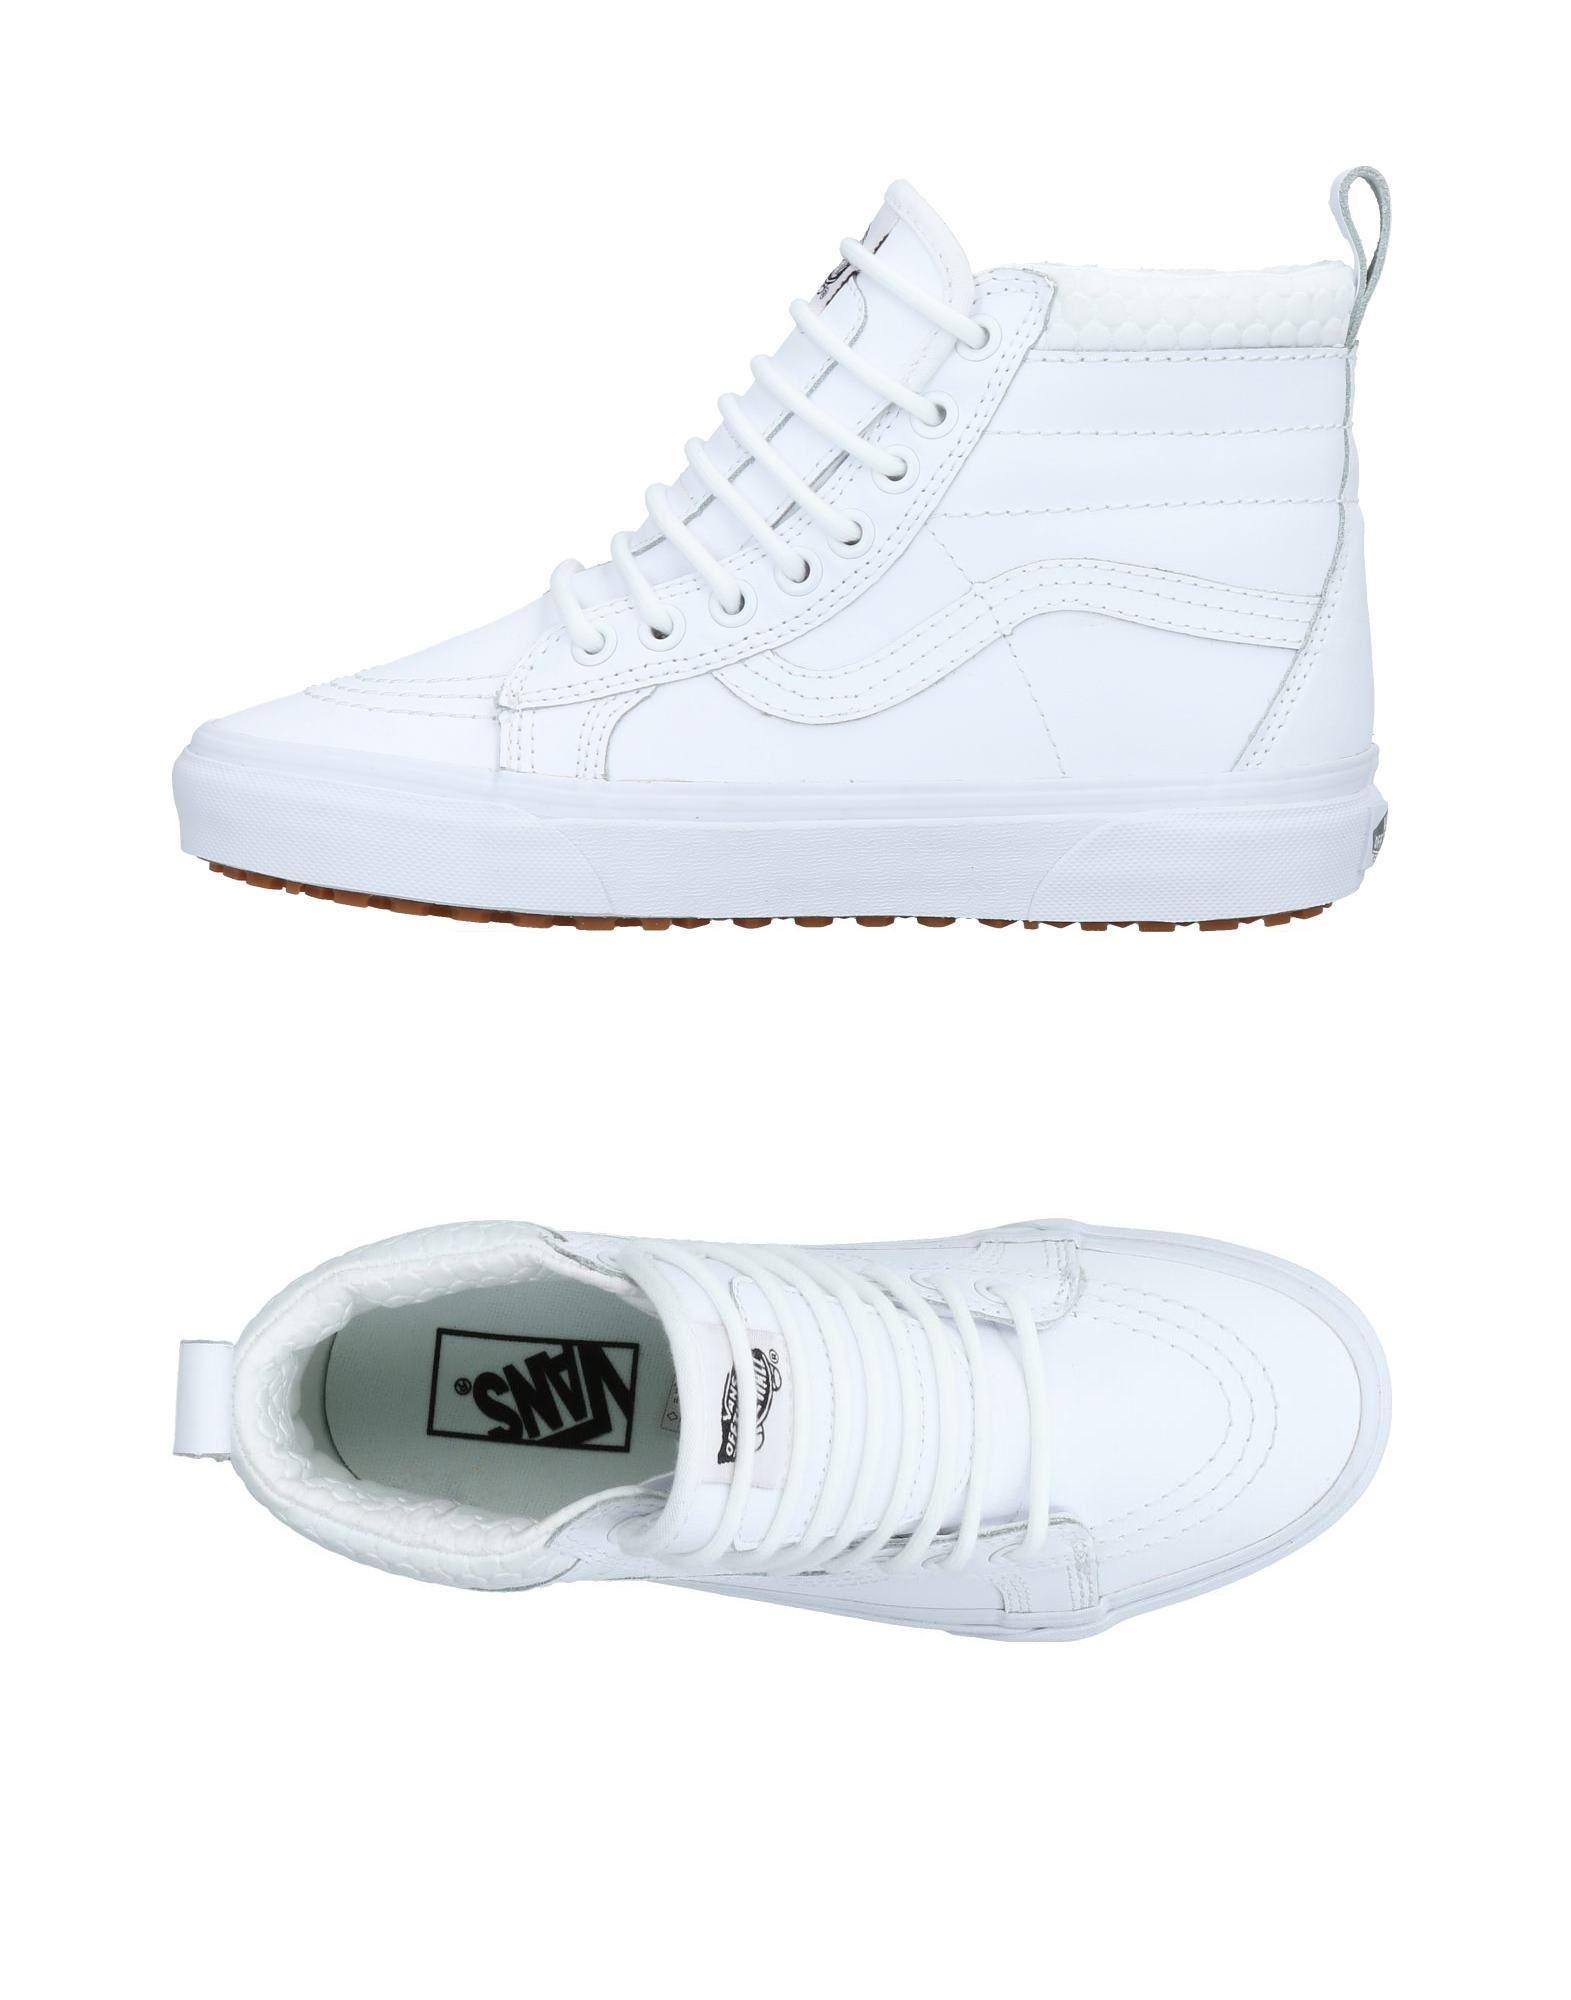 c17217d105eee2 Vans High-tops   Sneakers in White - Lyst